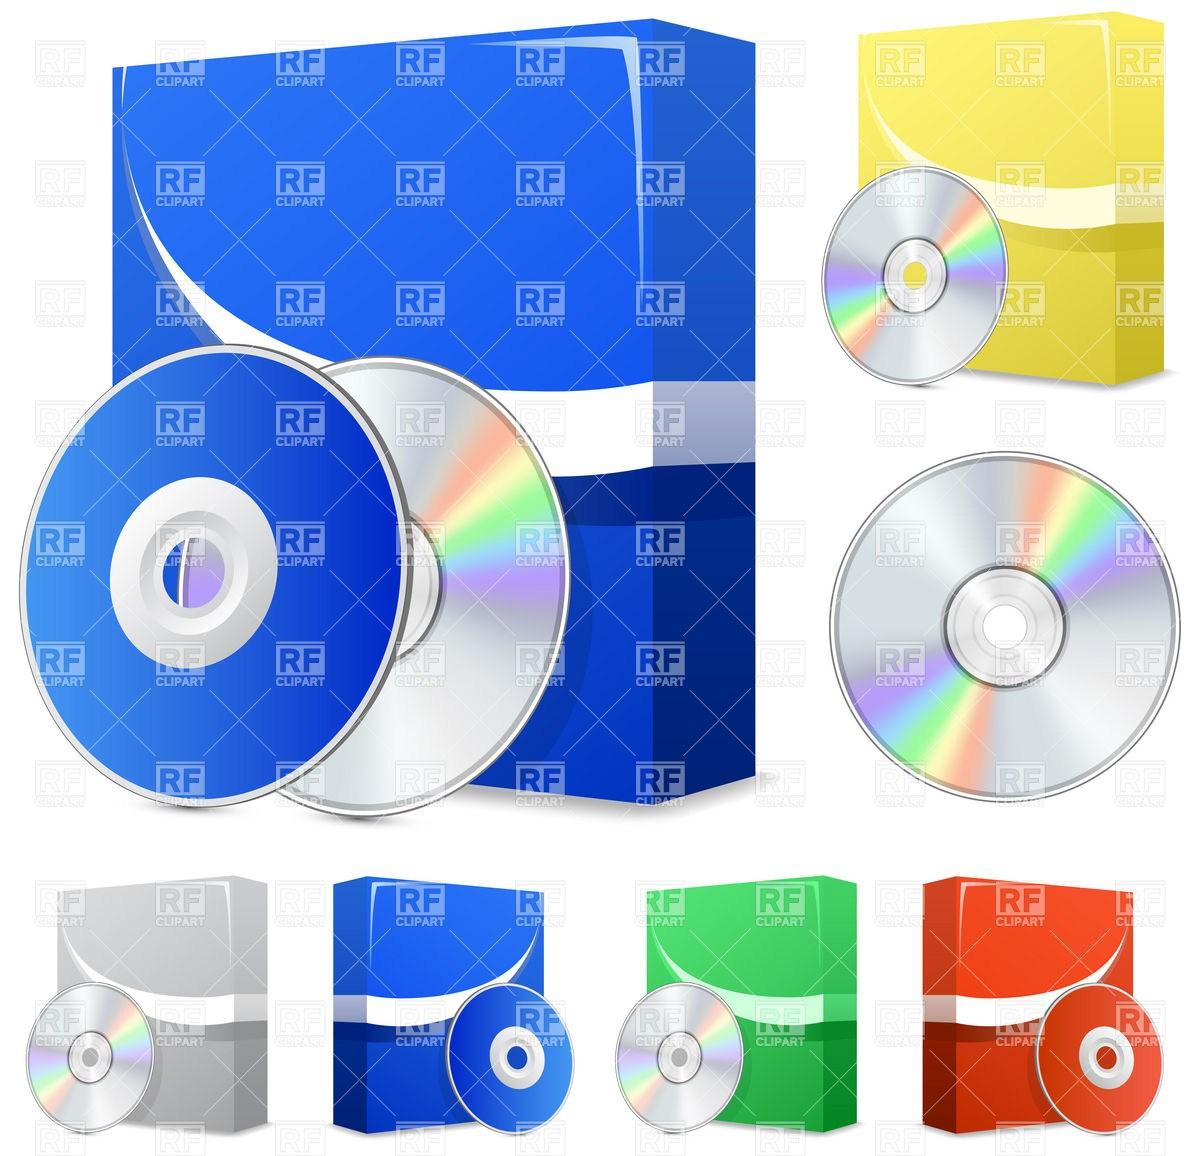 Clipart software free download 2 » Clipart Portal.